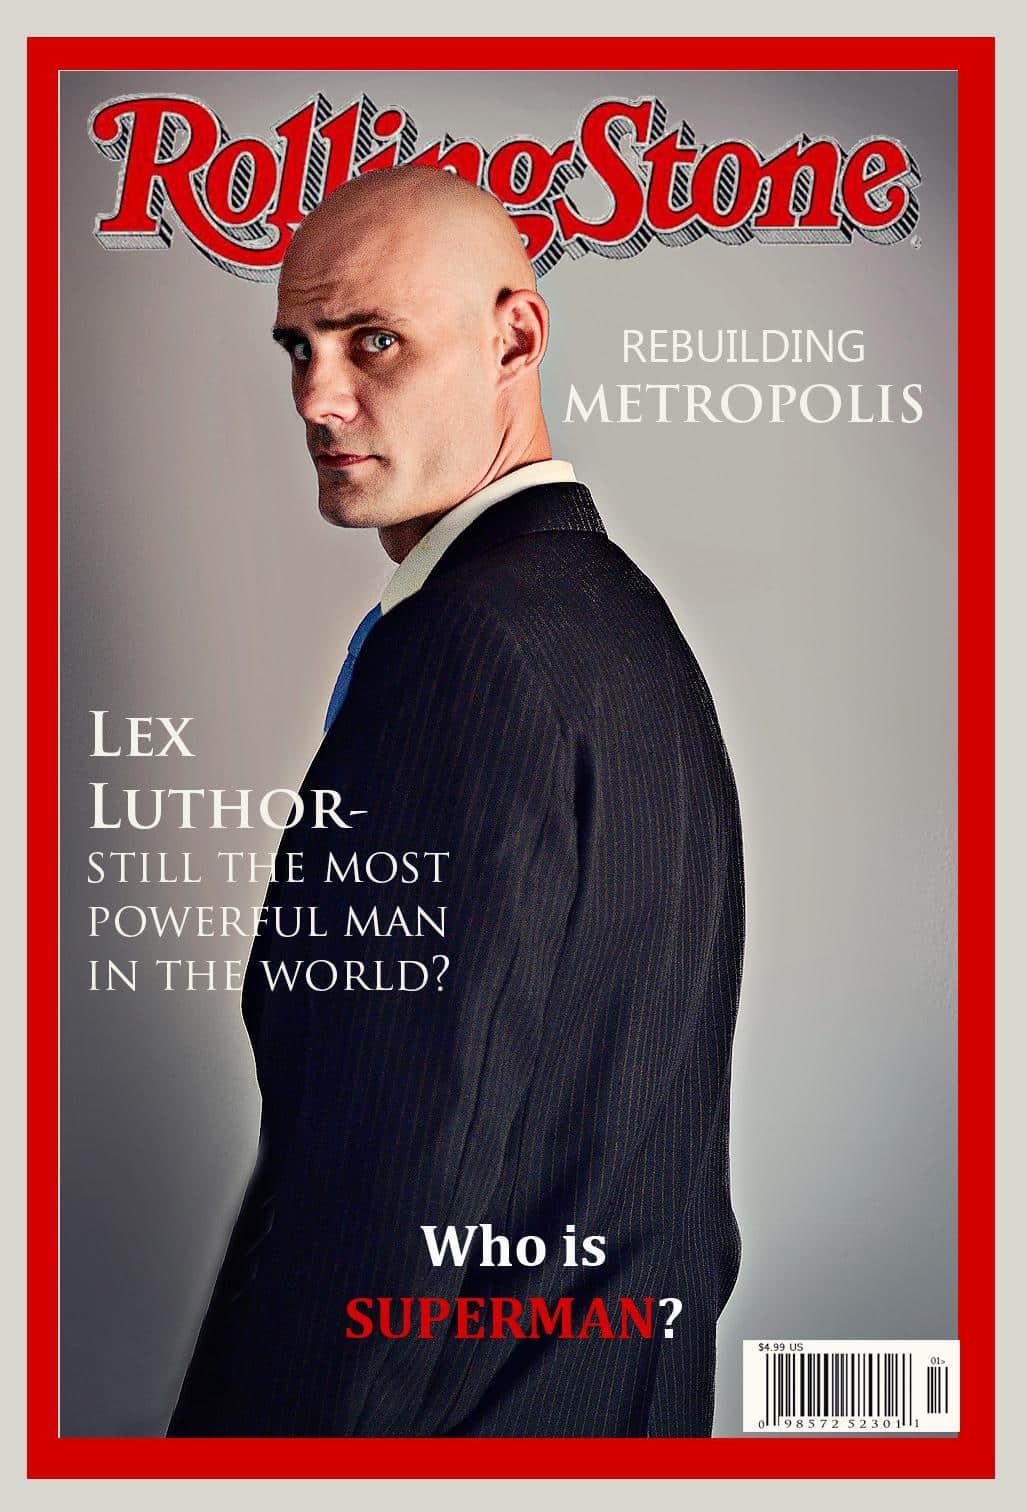 lex luthor lettman